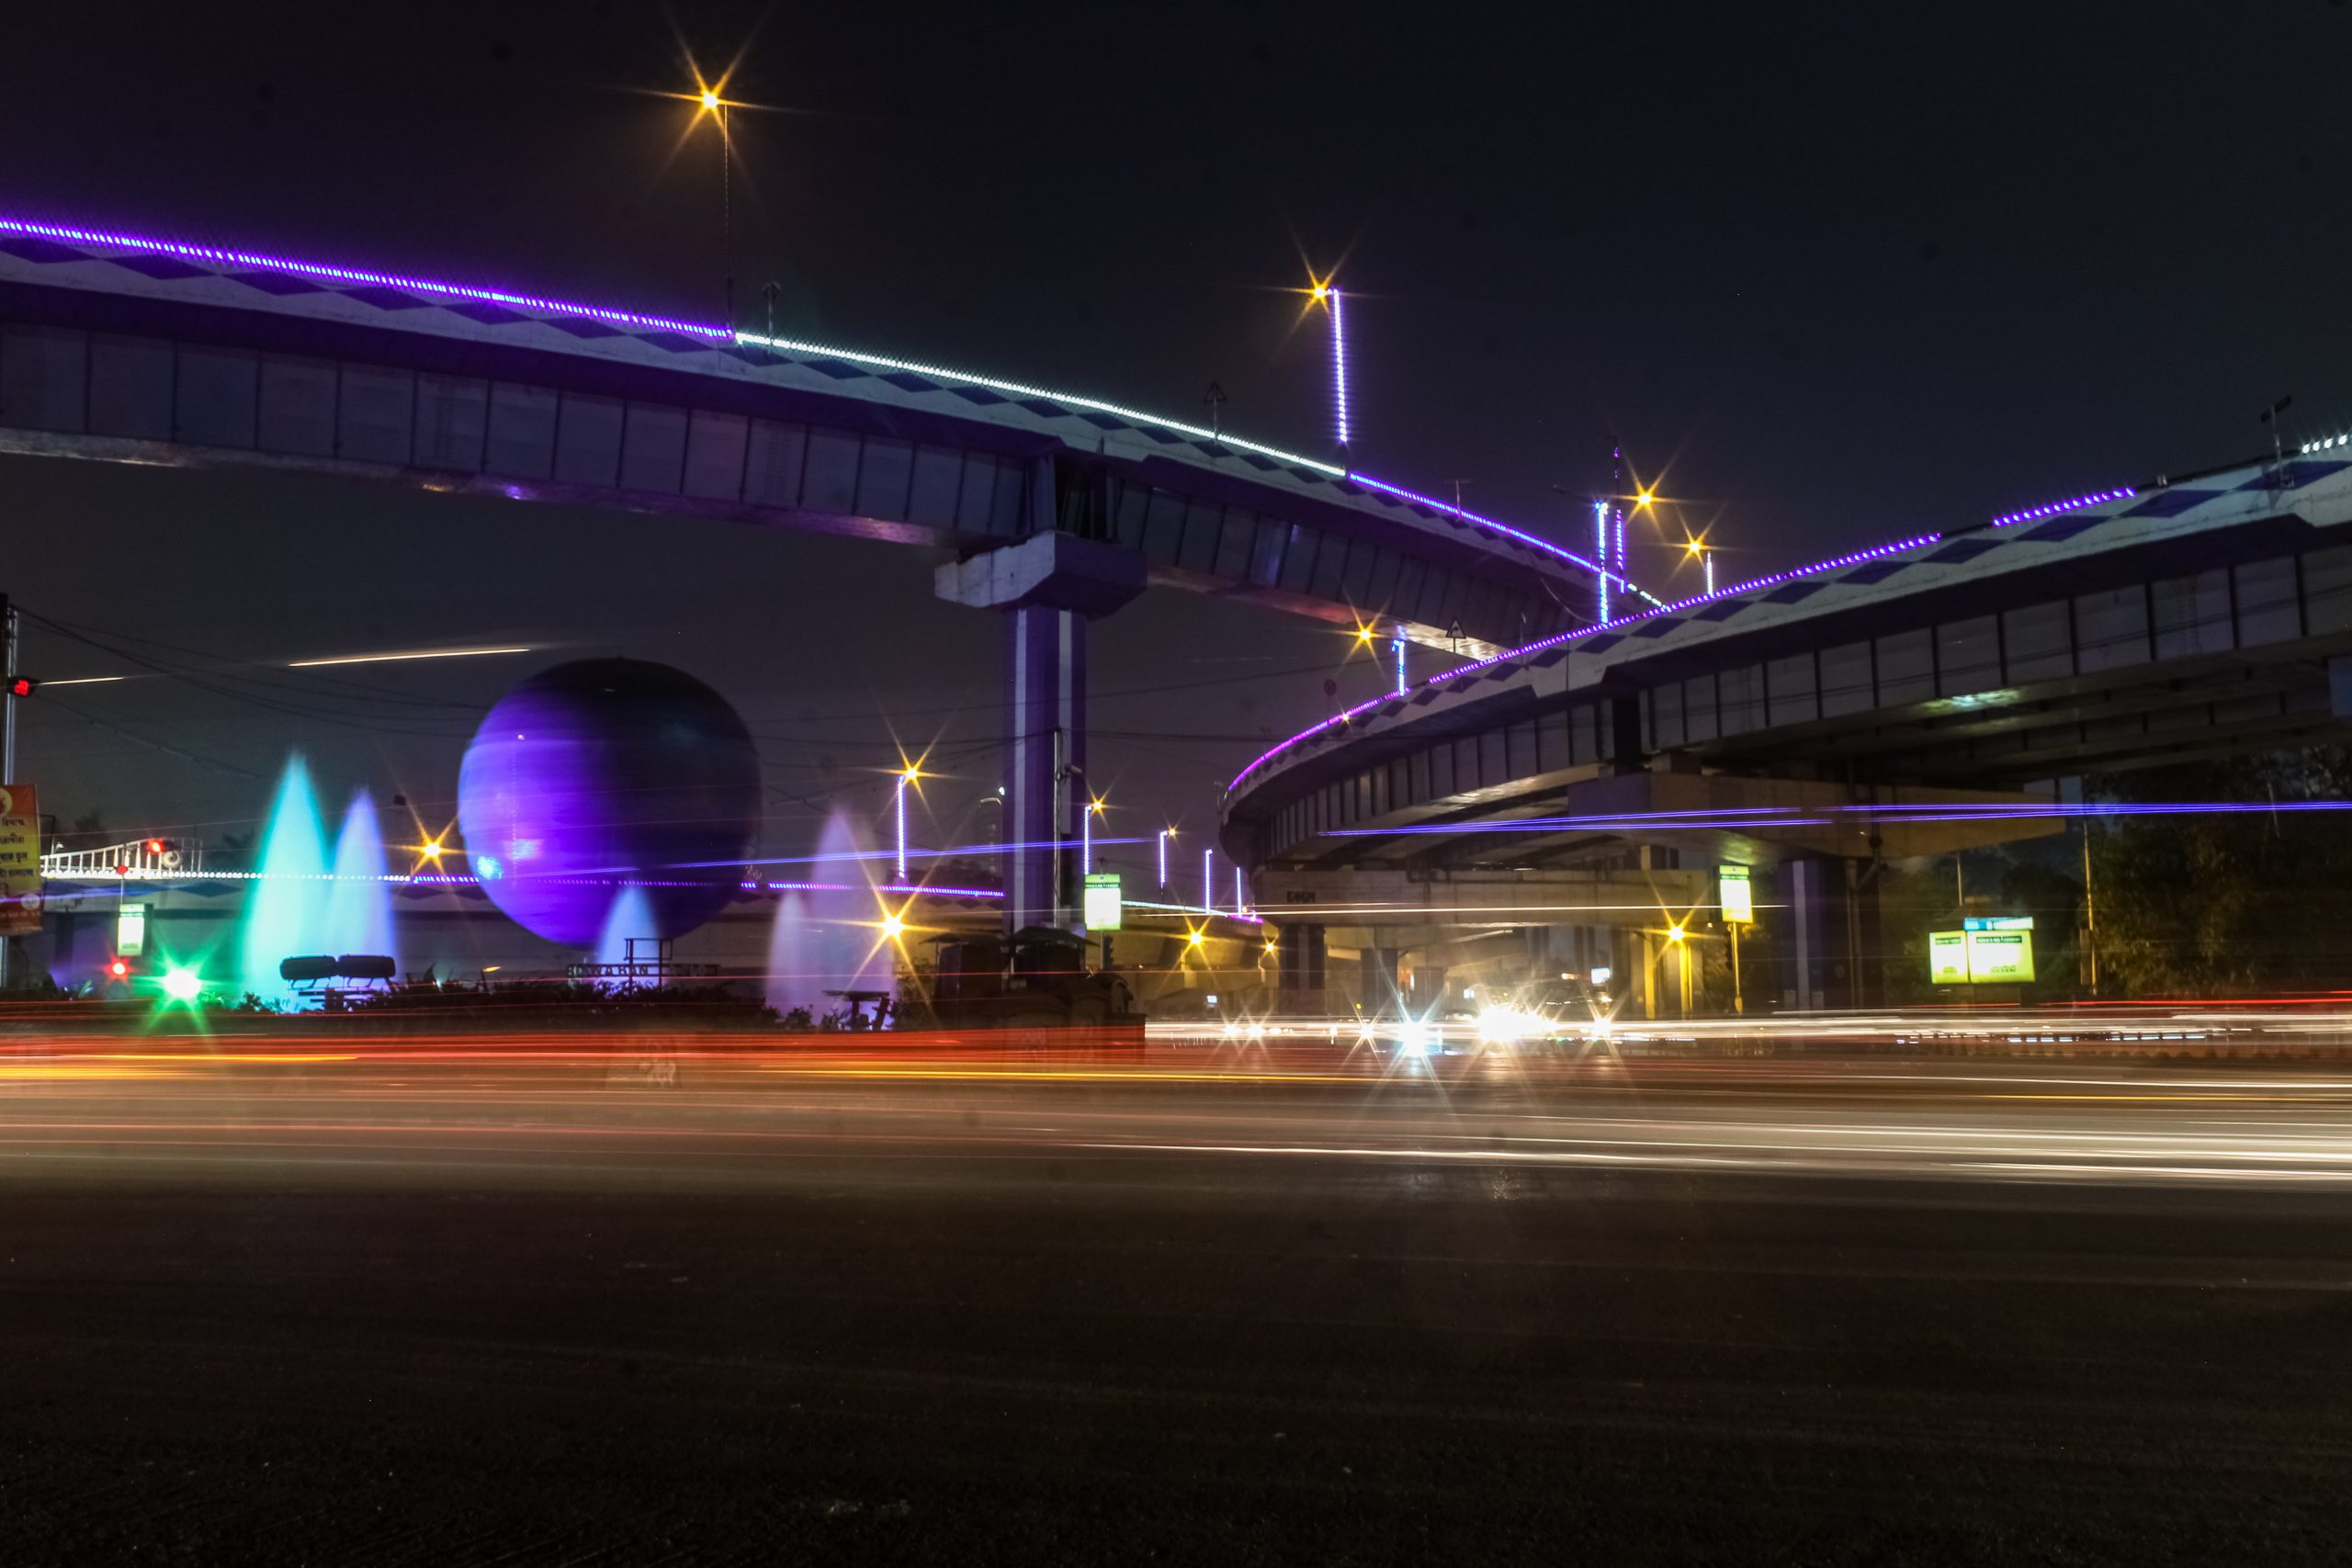 Night view of Kolkata roads